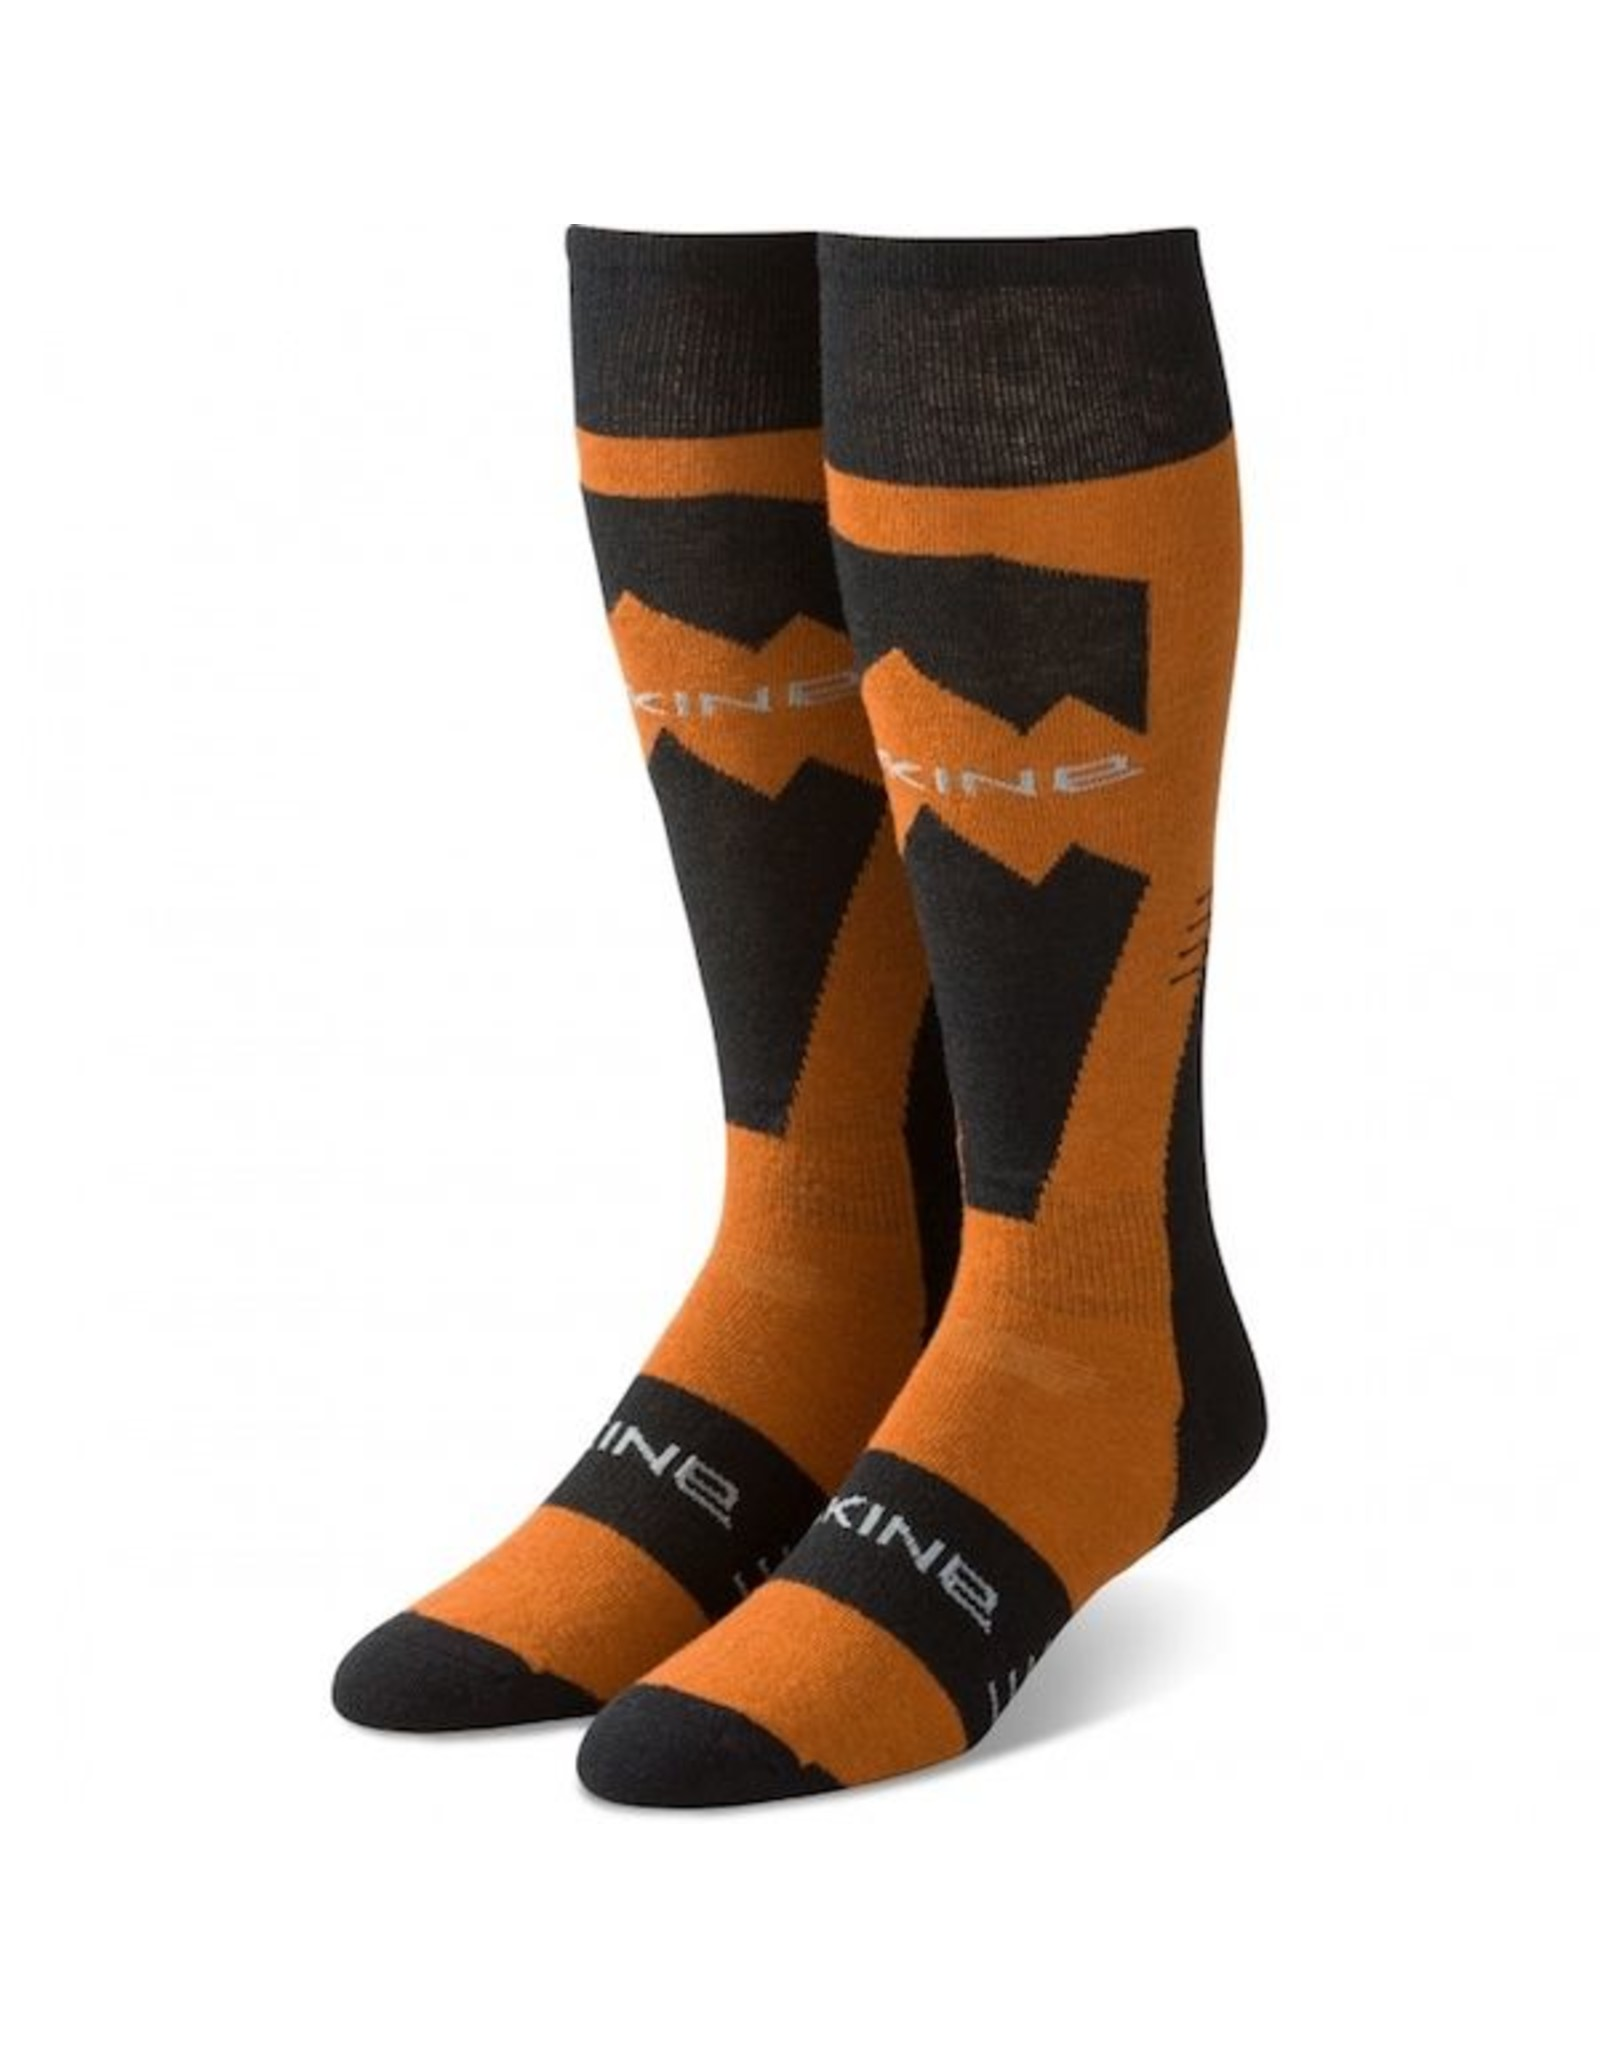 Dakine Dakine - Men's Summit Sock - Ginger – M/L